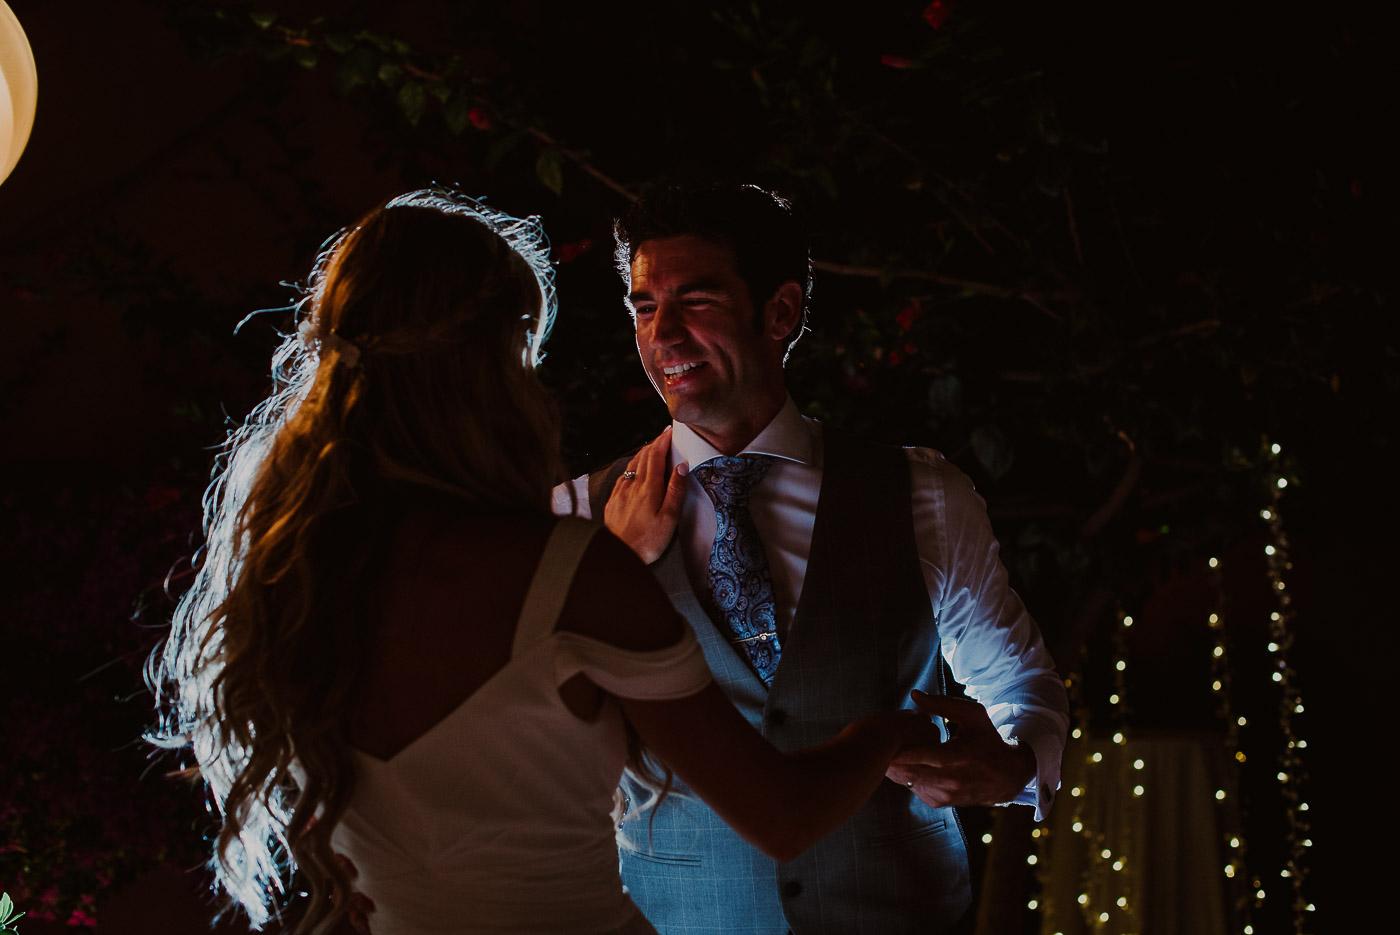 fotografo-bodas-malaga-boda-castillo-santa-catalina-manuel-fijo